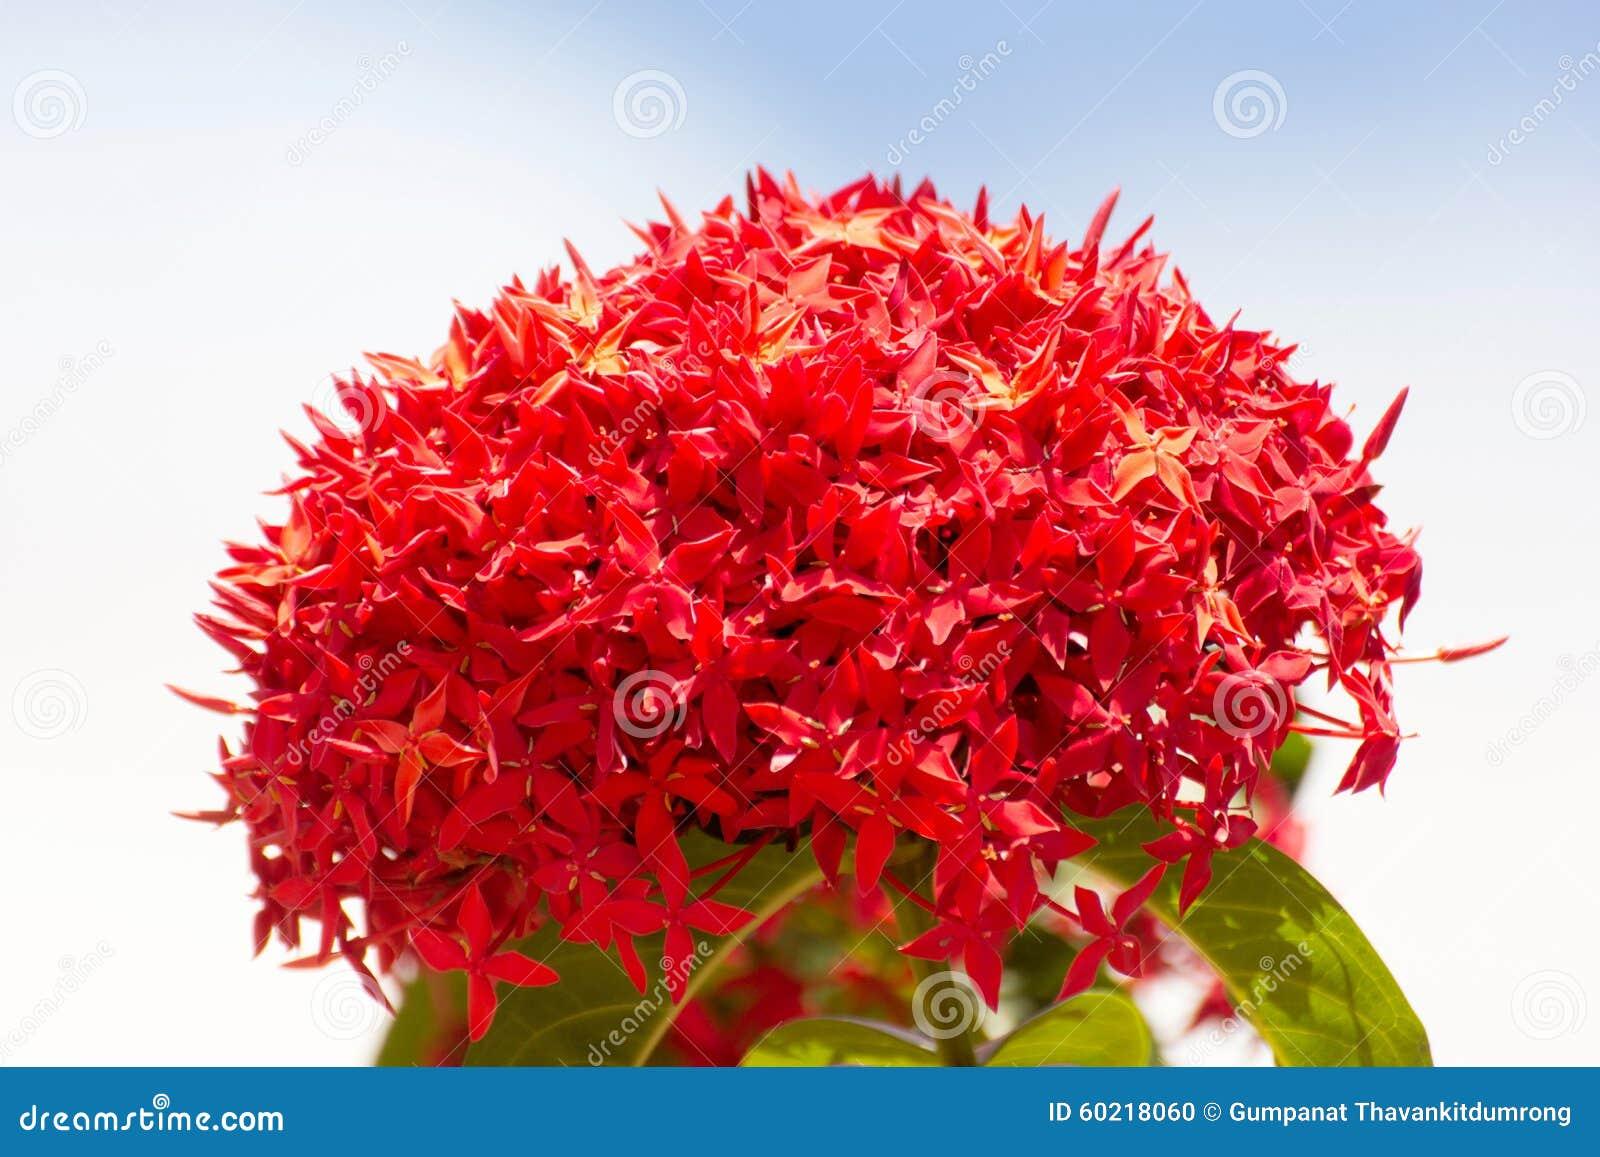 Bunch Of Beautiful Red Ixora Flowers Indian Jasmine Scientific